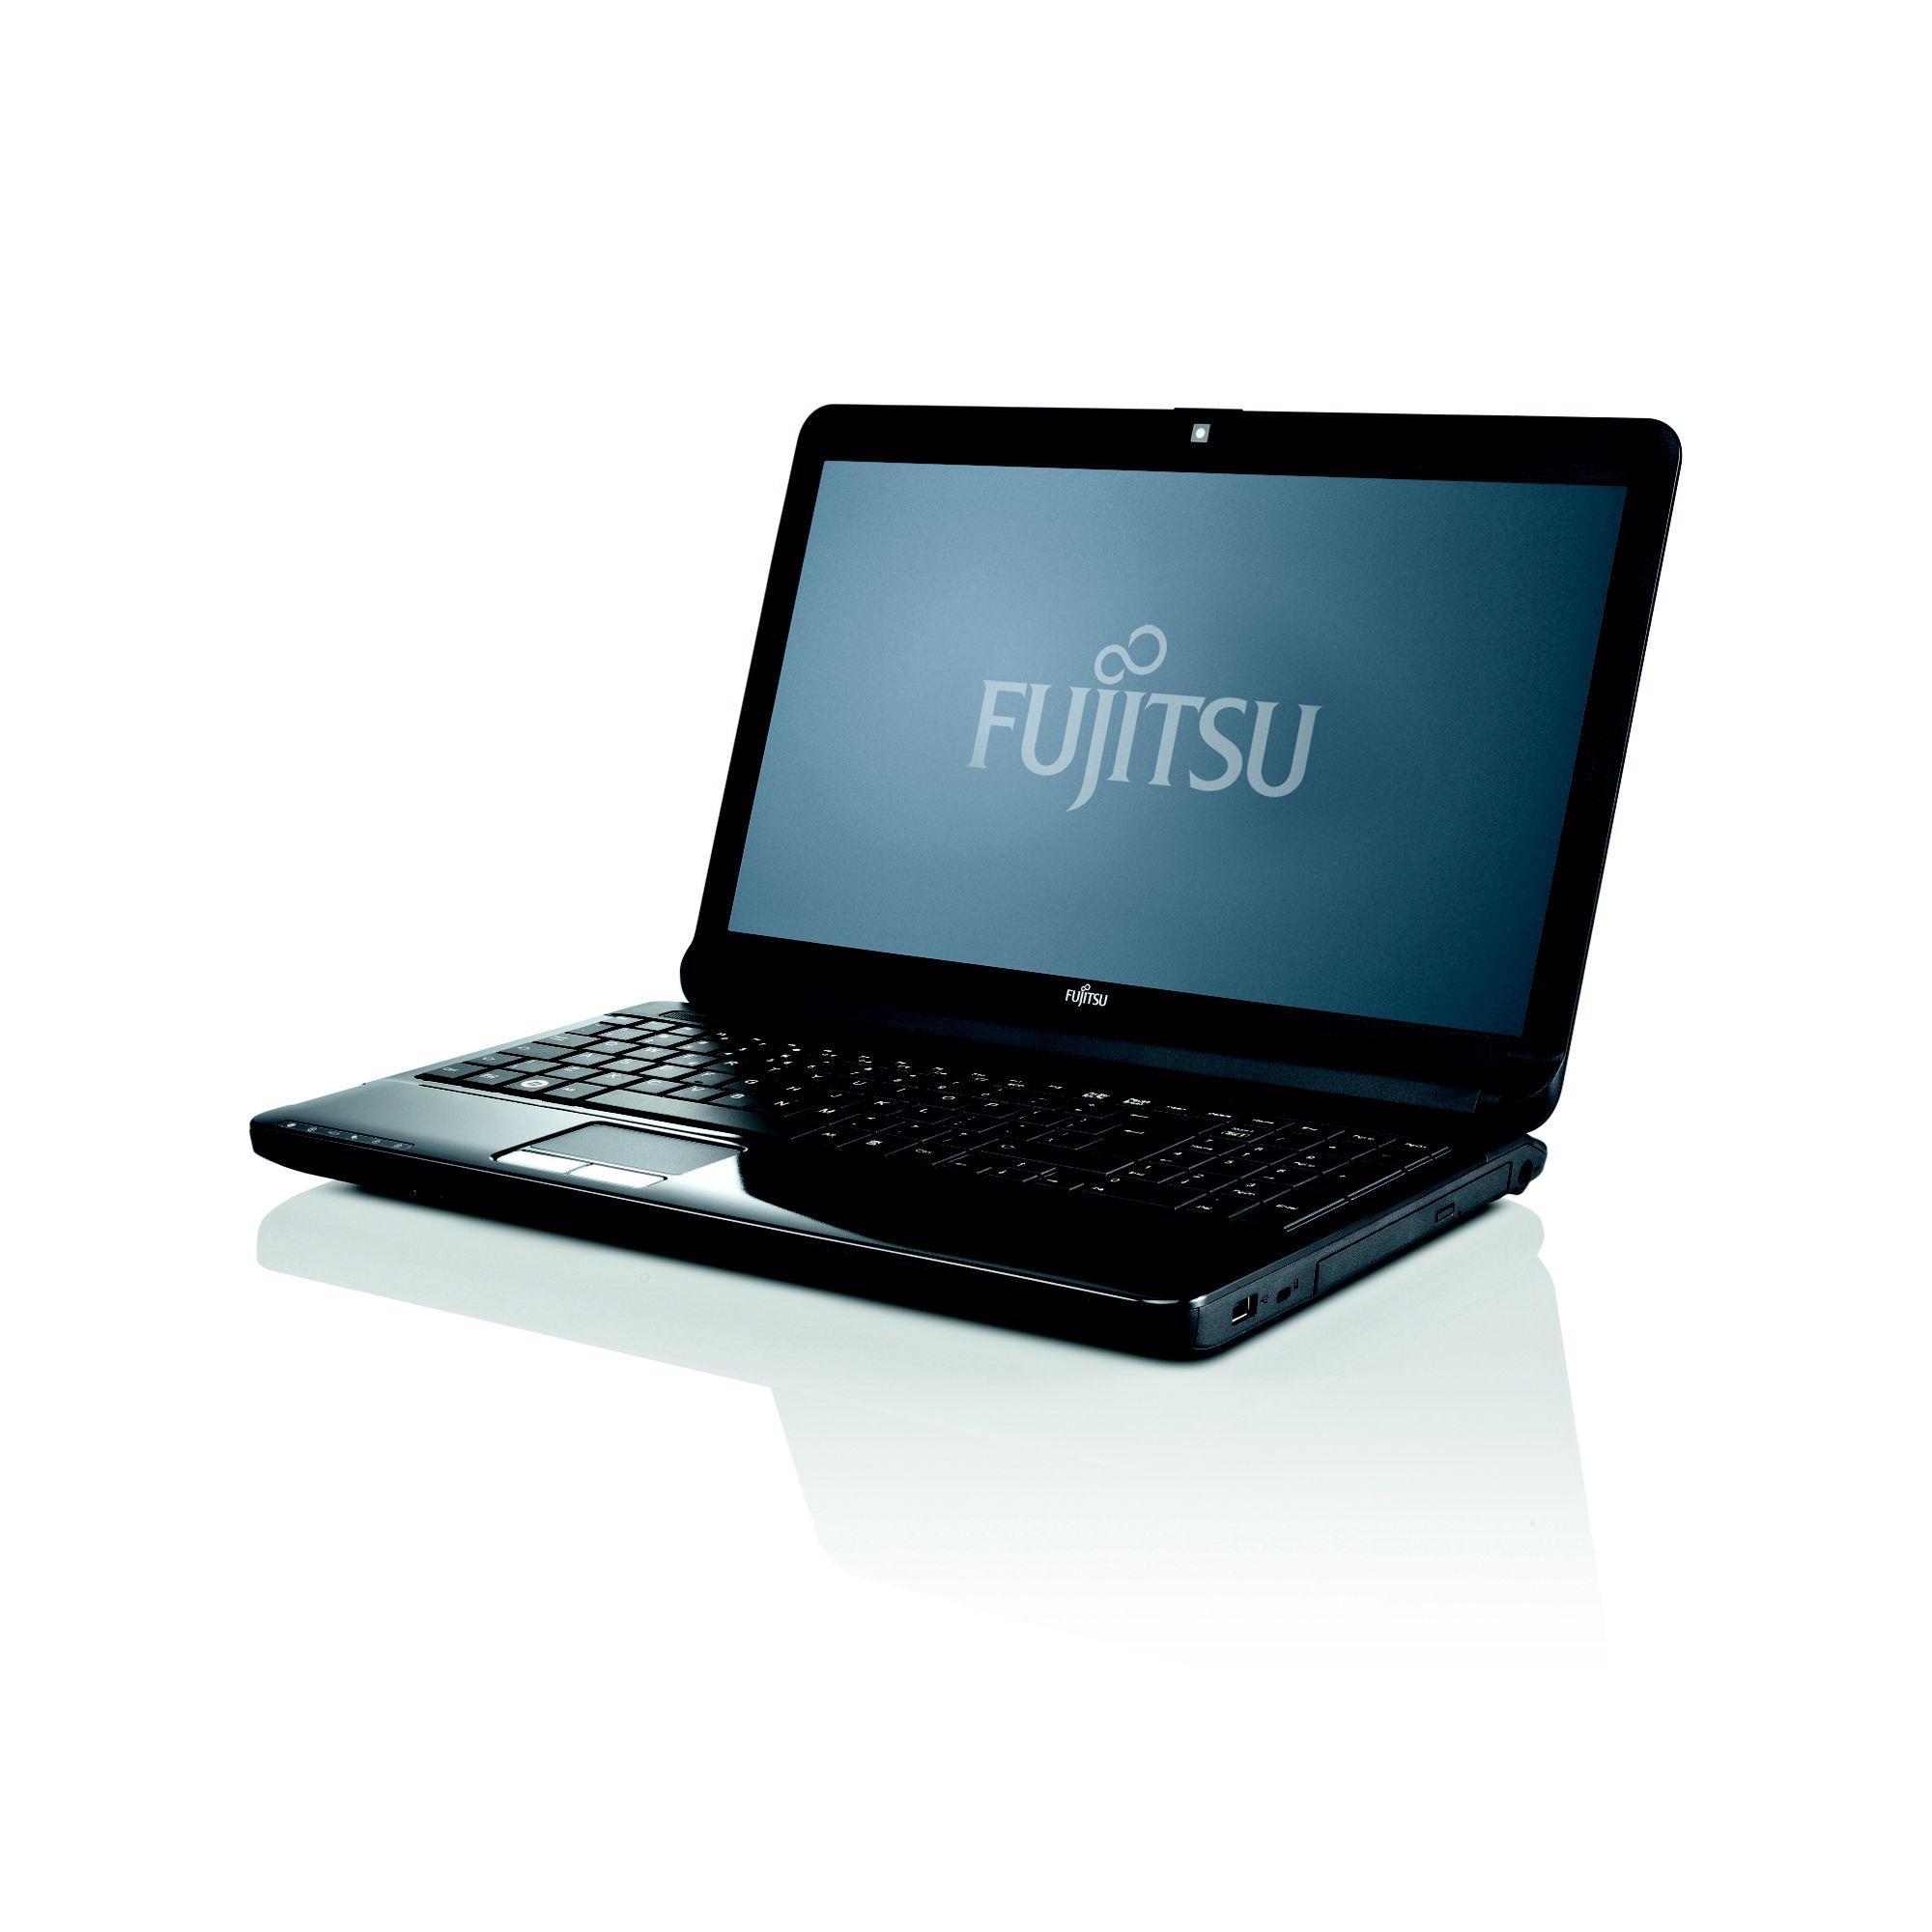 Fujitsu Lifebook 15.6 inch Notebook PC AH530 Pentium P6200 2.13GHz 2GB 320GB DVD+RW Windows 7 Home Premium 64-bit at Tesco Direct